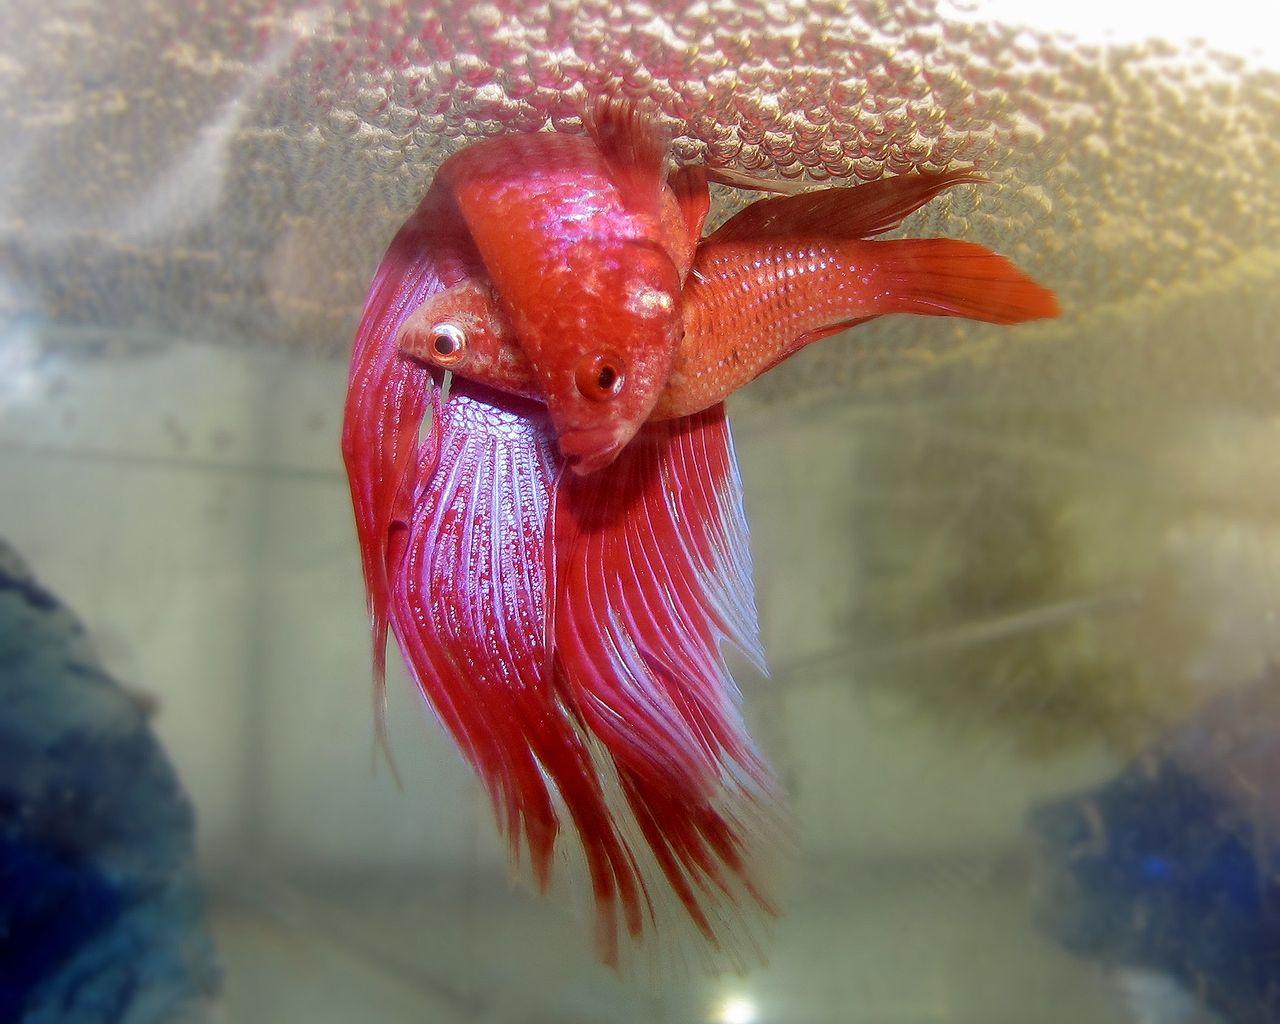 Rainbow s bride love among the betta splendens florasforum for Lifespan of a betta fish in captivity